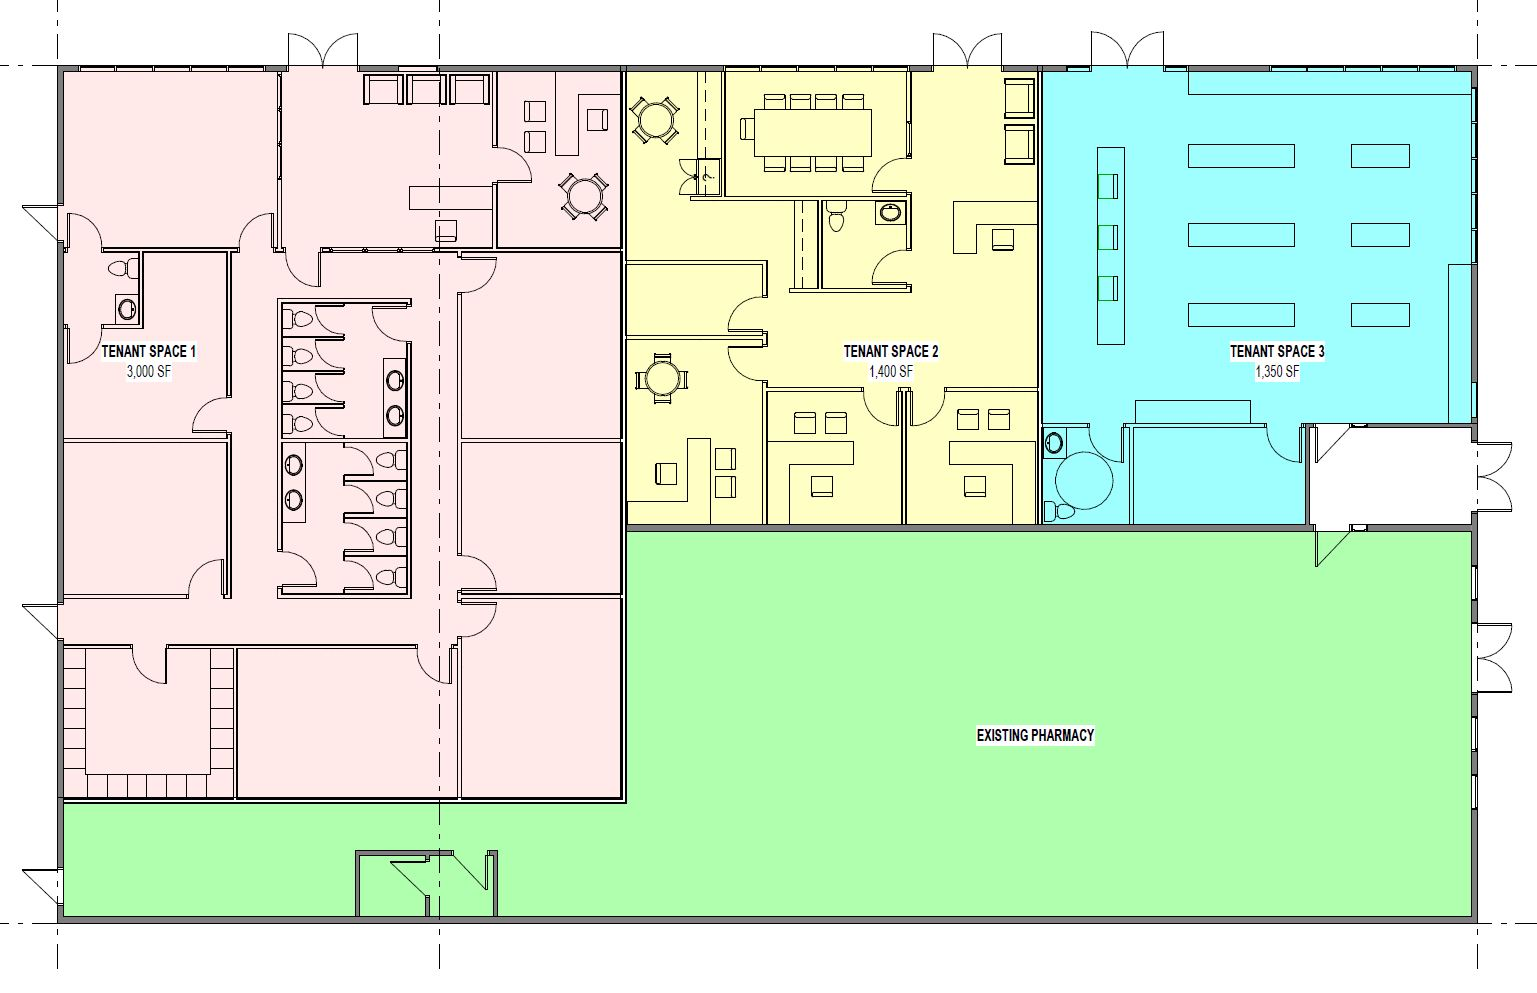 1606870211_ponoka_town_centre_site_demising_plan.jpg